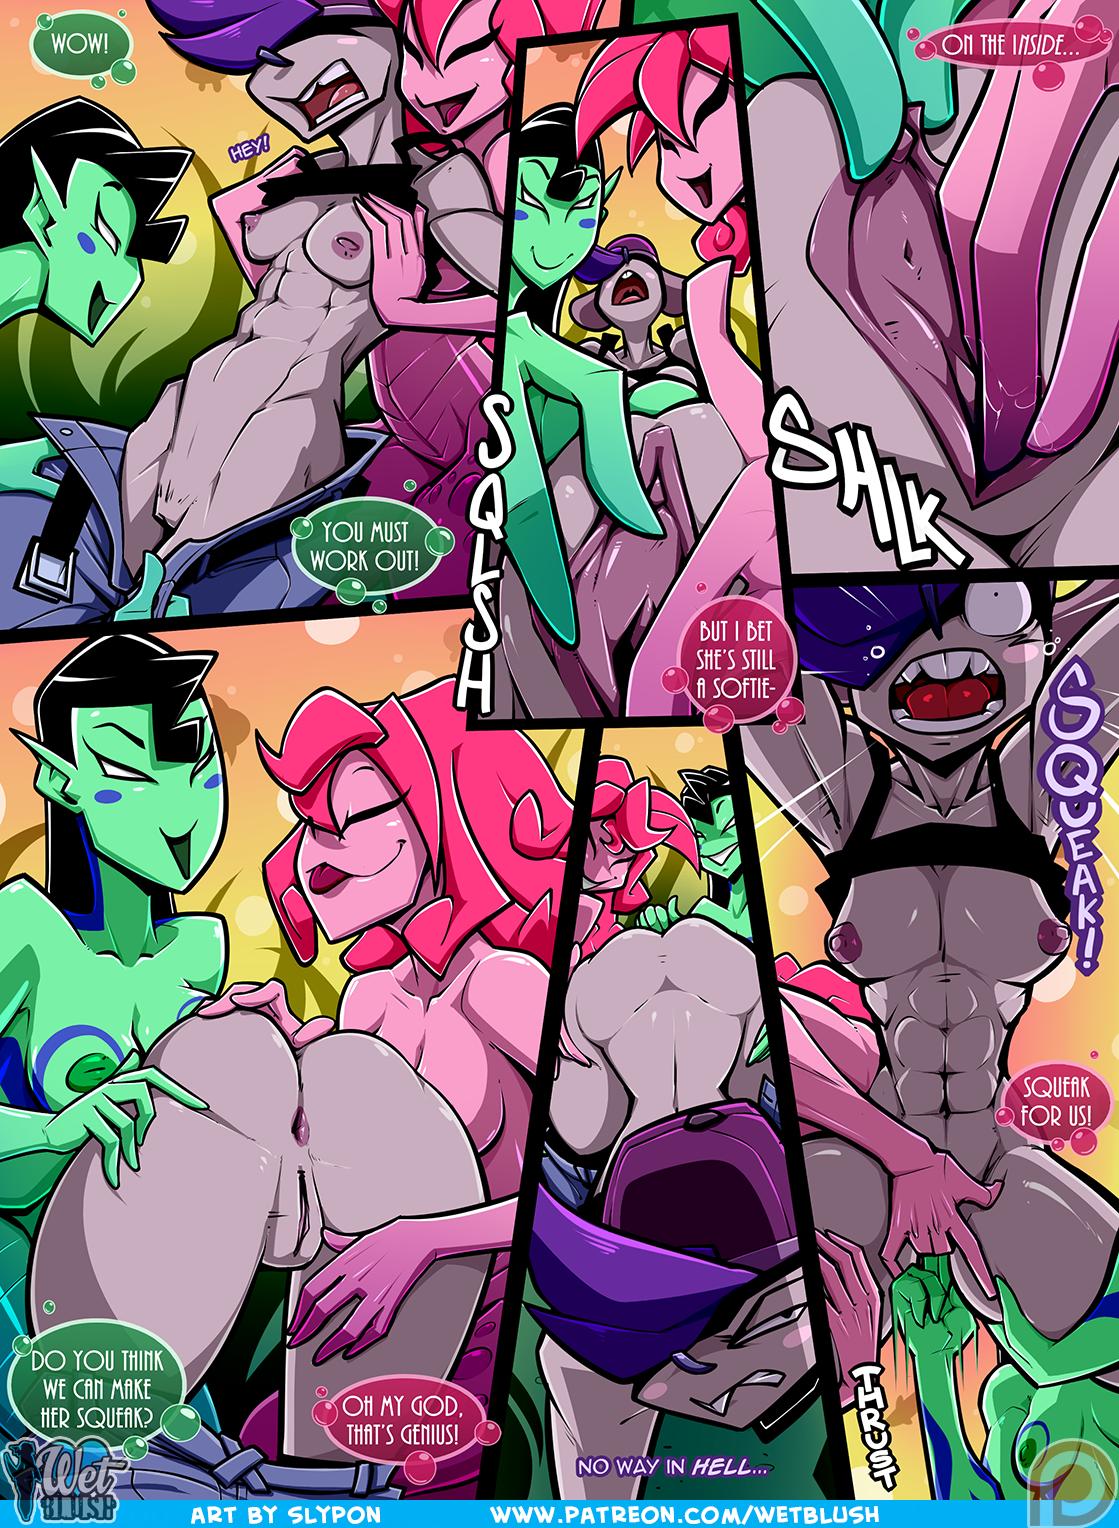 Summons porn comics Group Sex, Aliens, Furry, Lesbians, Sci-Fi